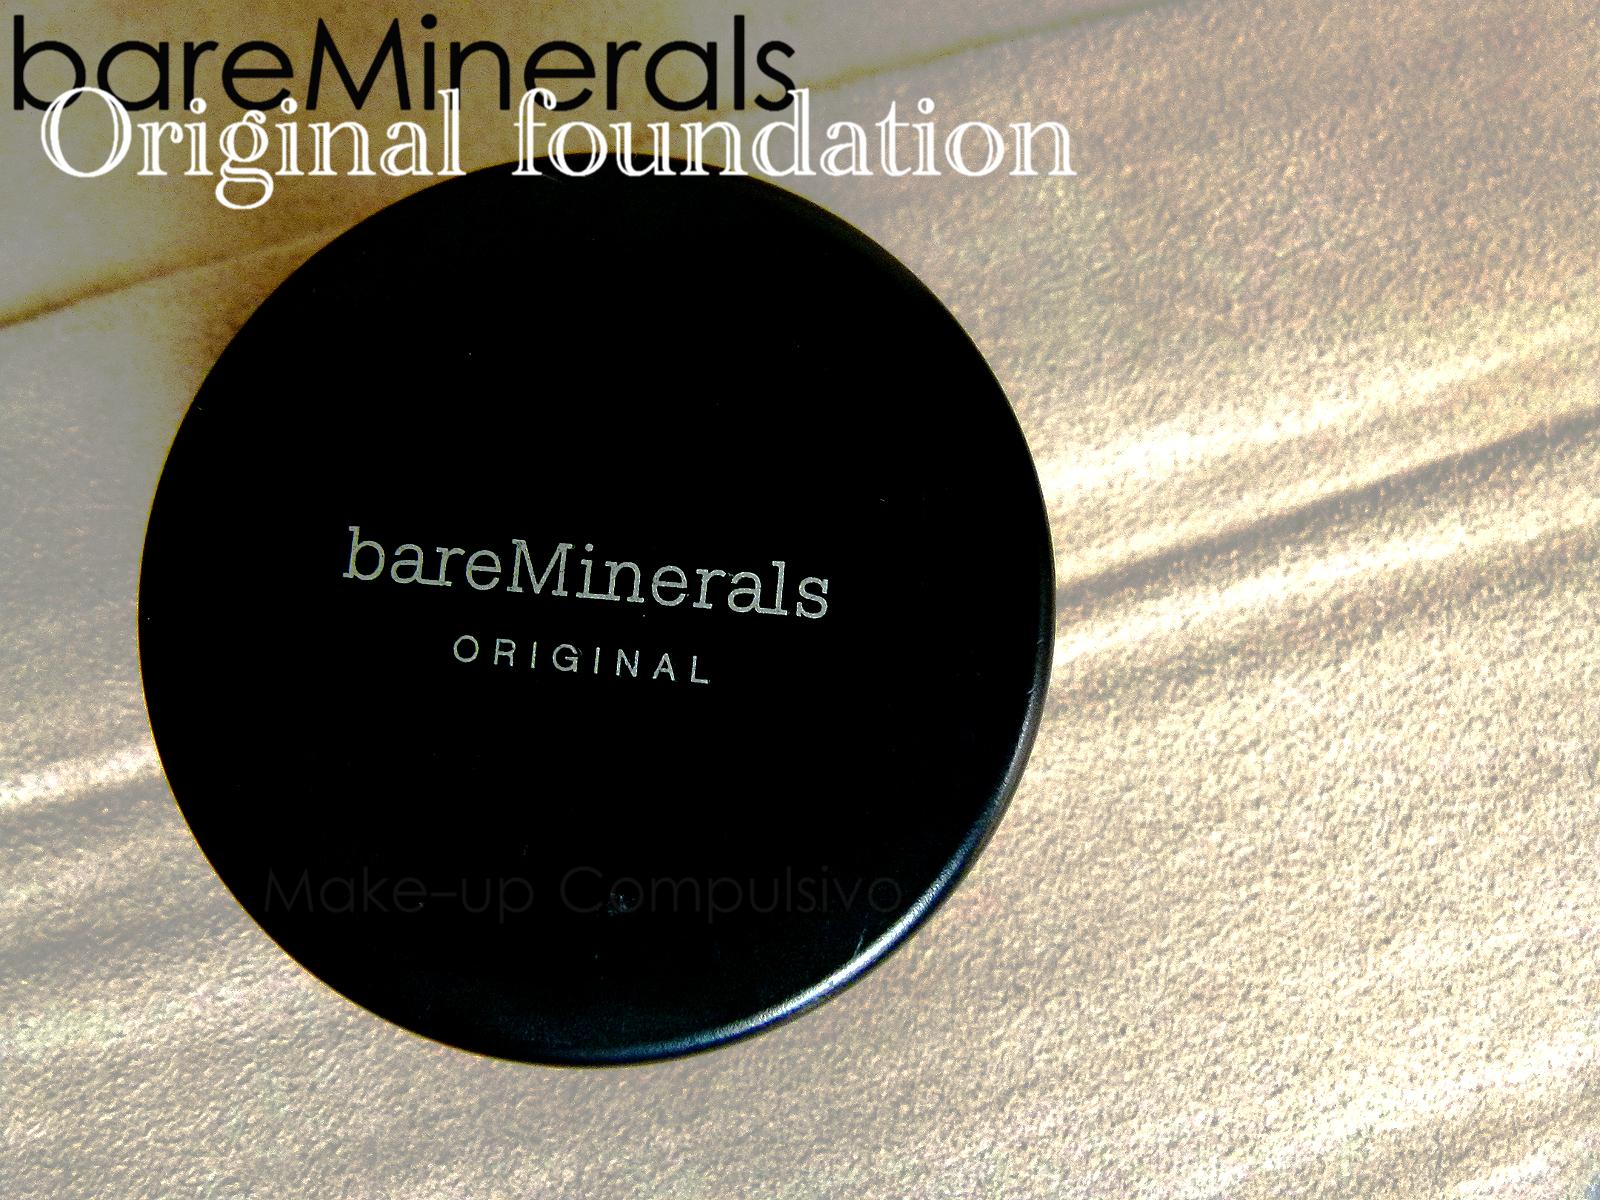 BareMinerals, fondotinta in polvere versione Original: review